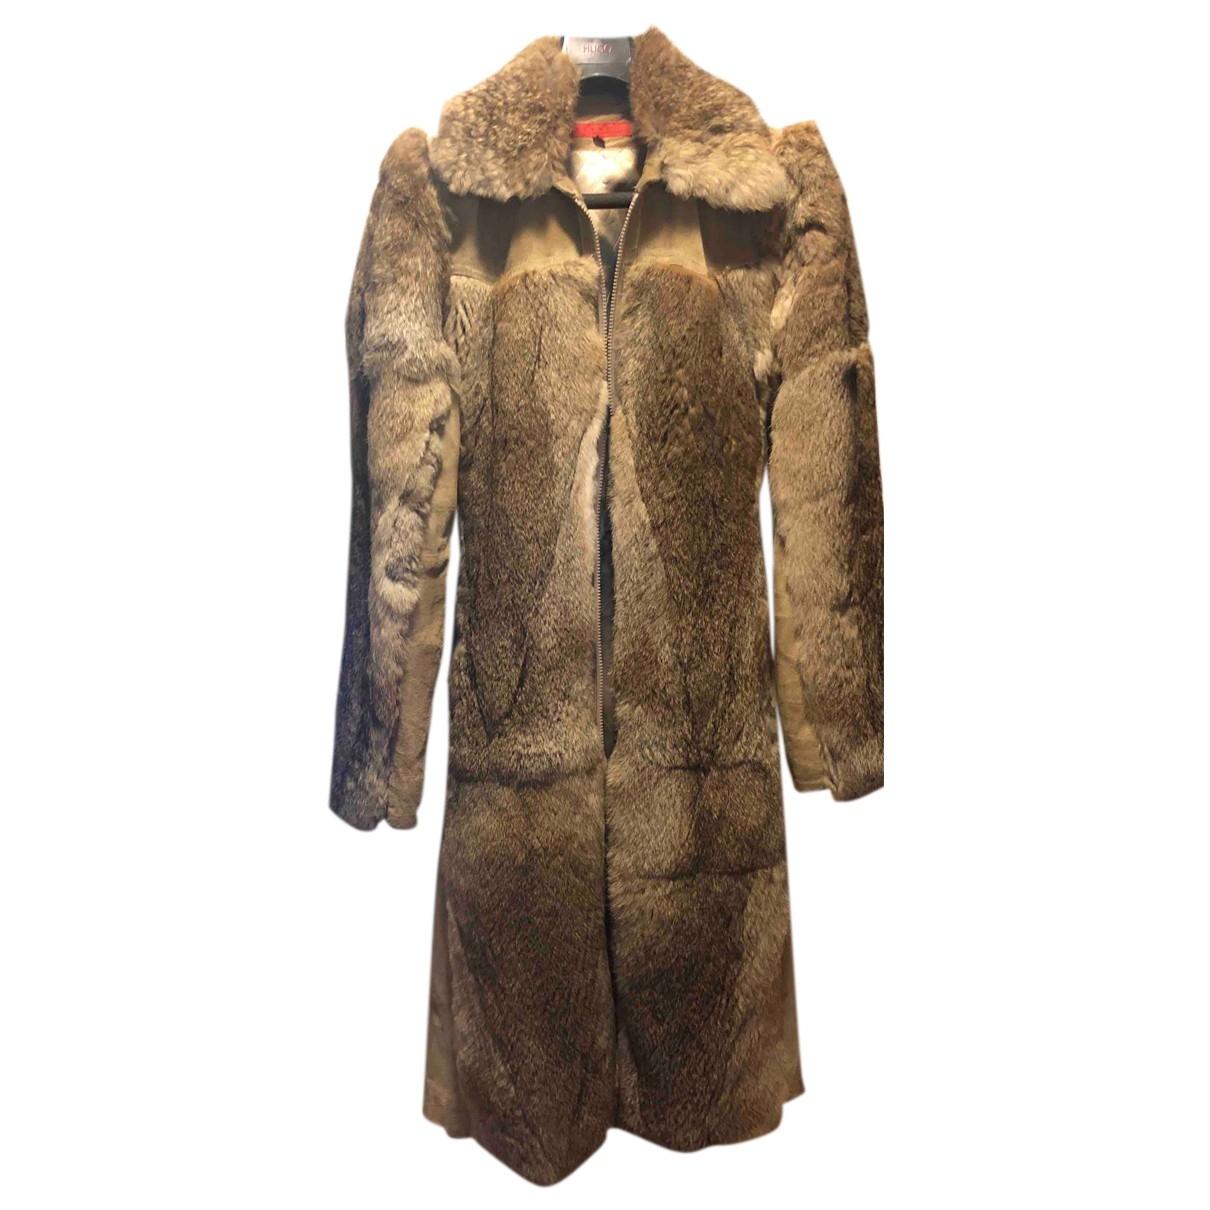 Hallhuber \N Beige Rabbit coat for Women 36 FR